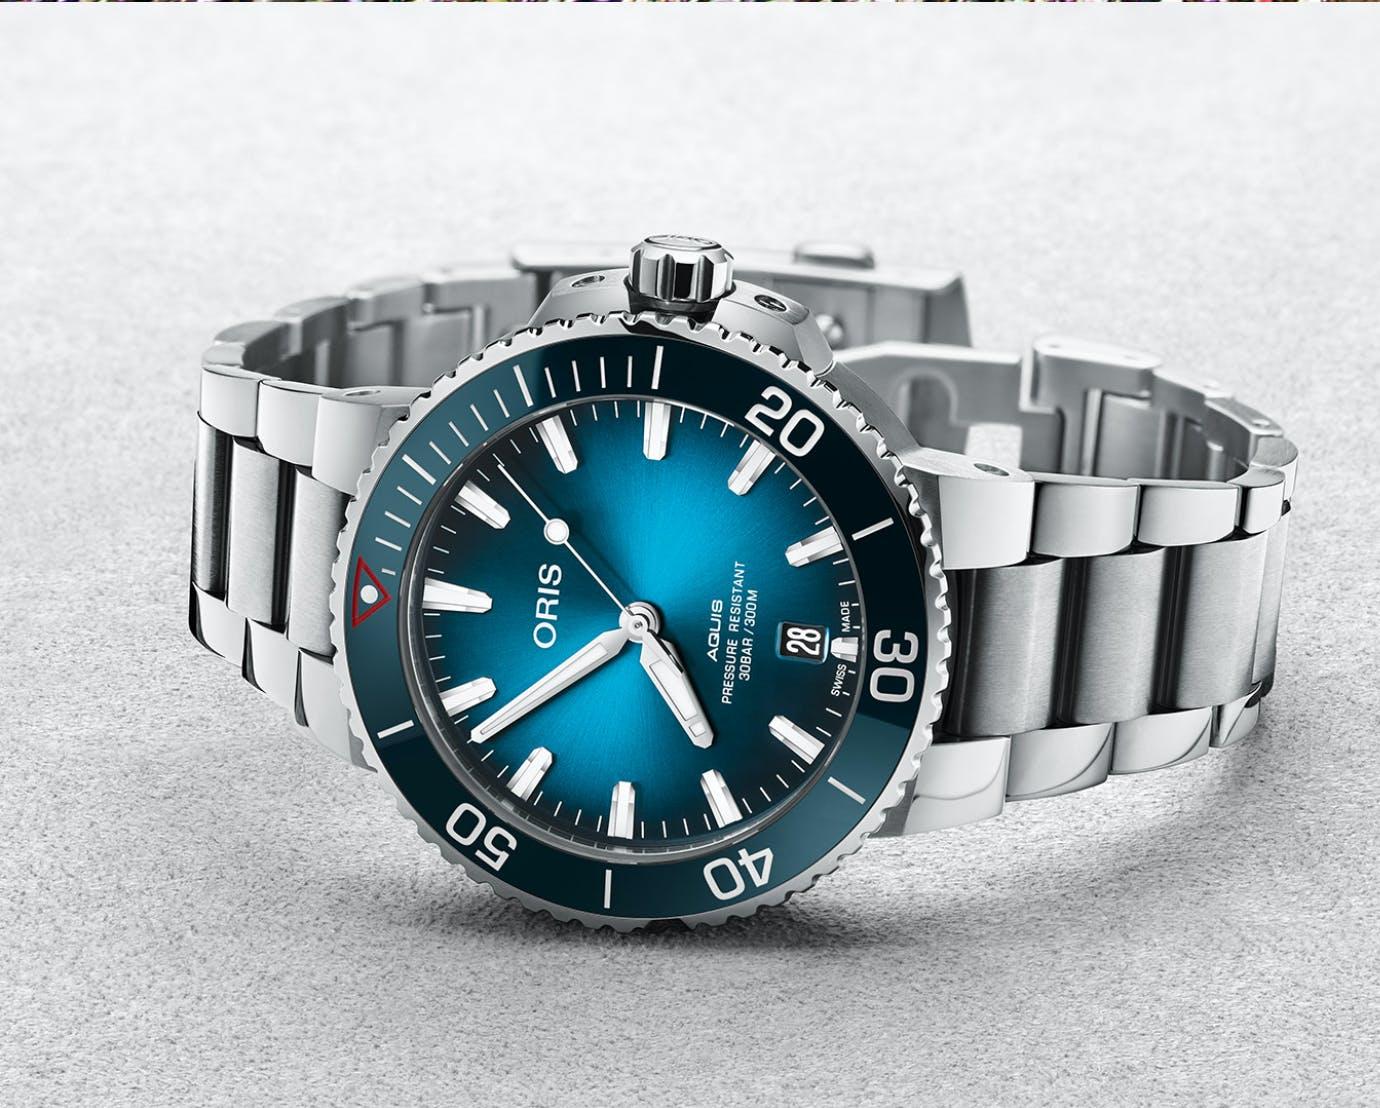 Oris Aquis Date, Clean Ocean Limited Edition